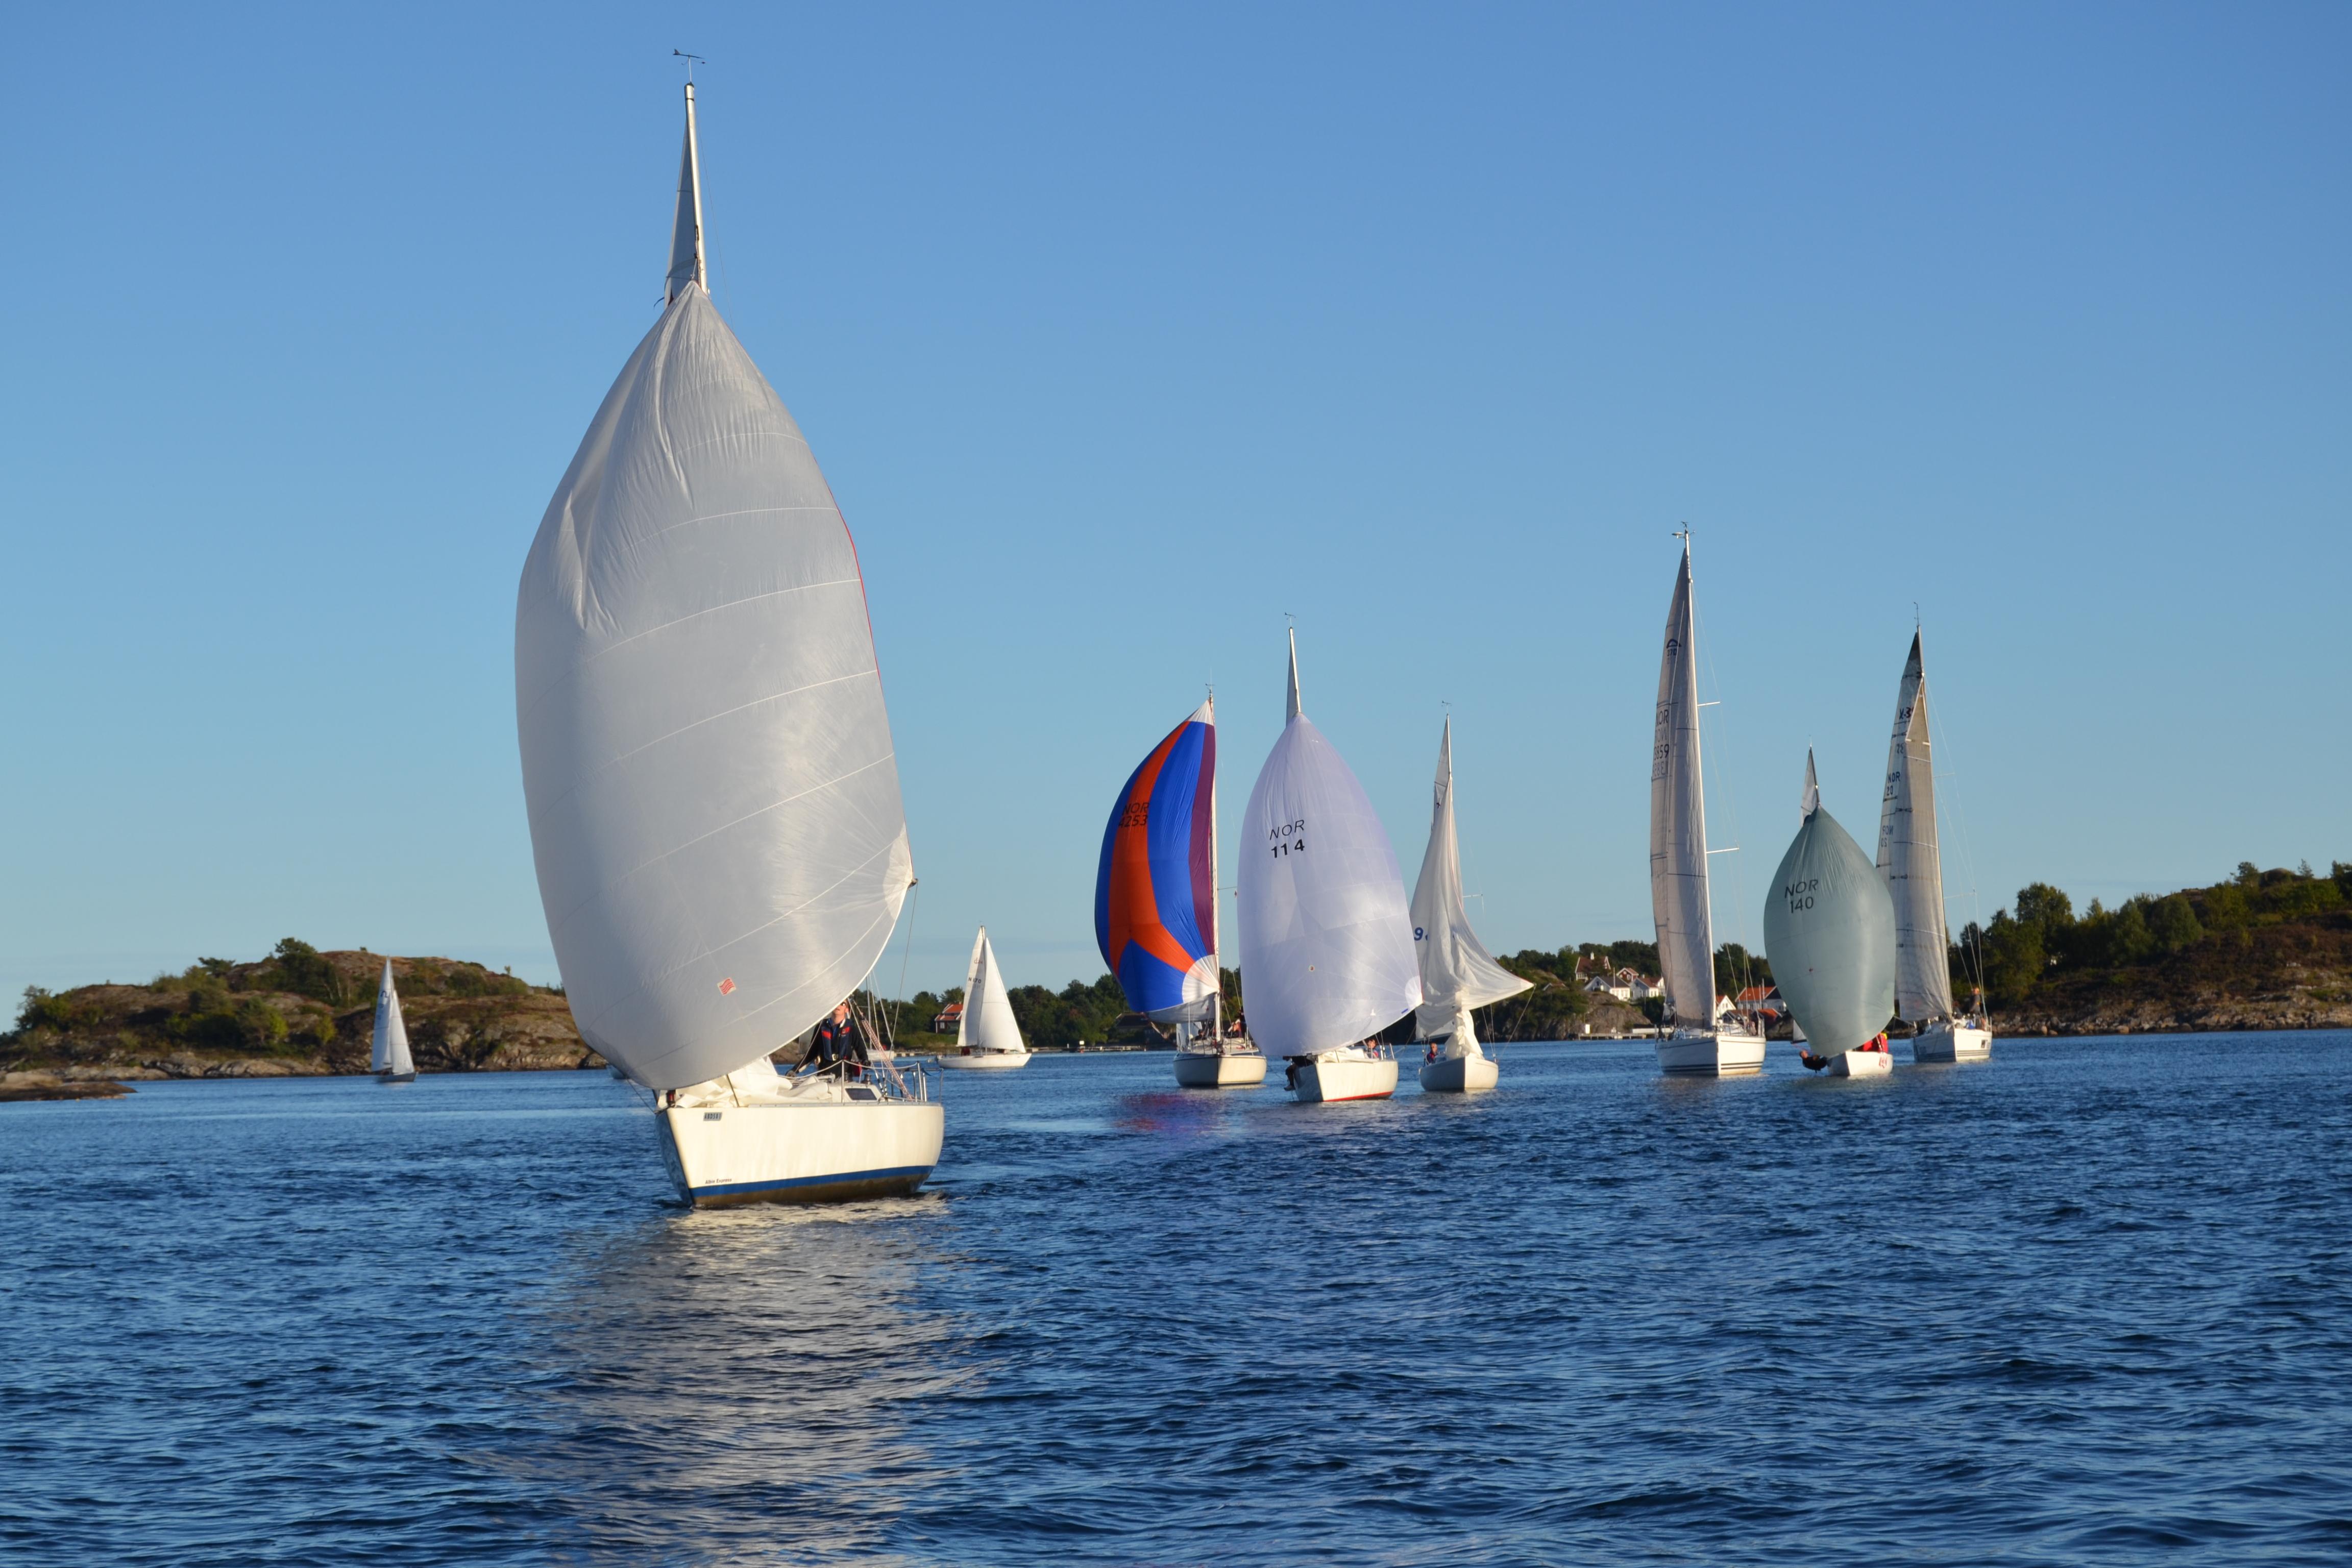 Seilingsbestemmelser og terminlista 2015 for tur og hav gruppa